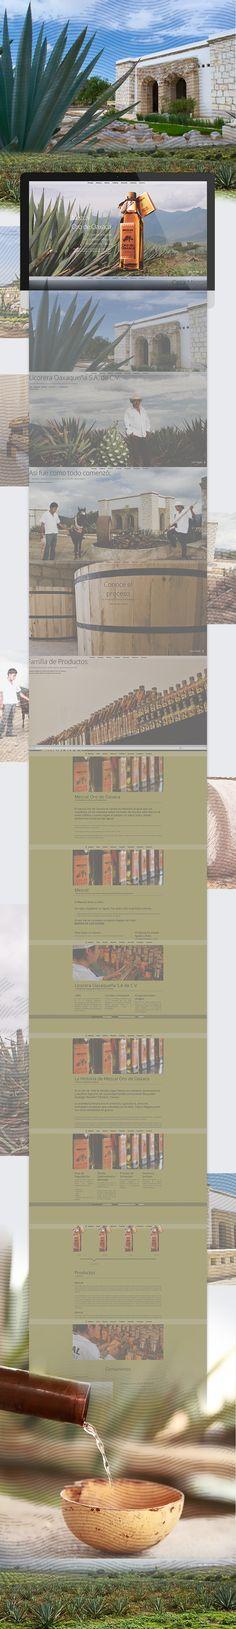 Propuesta de rediseño web para Mezcal Oro de Oaxaca  Art Direction, UI/UX, Web Design